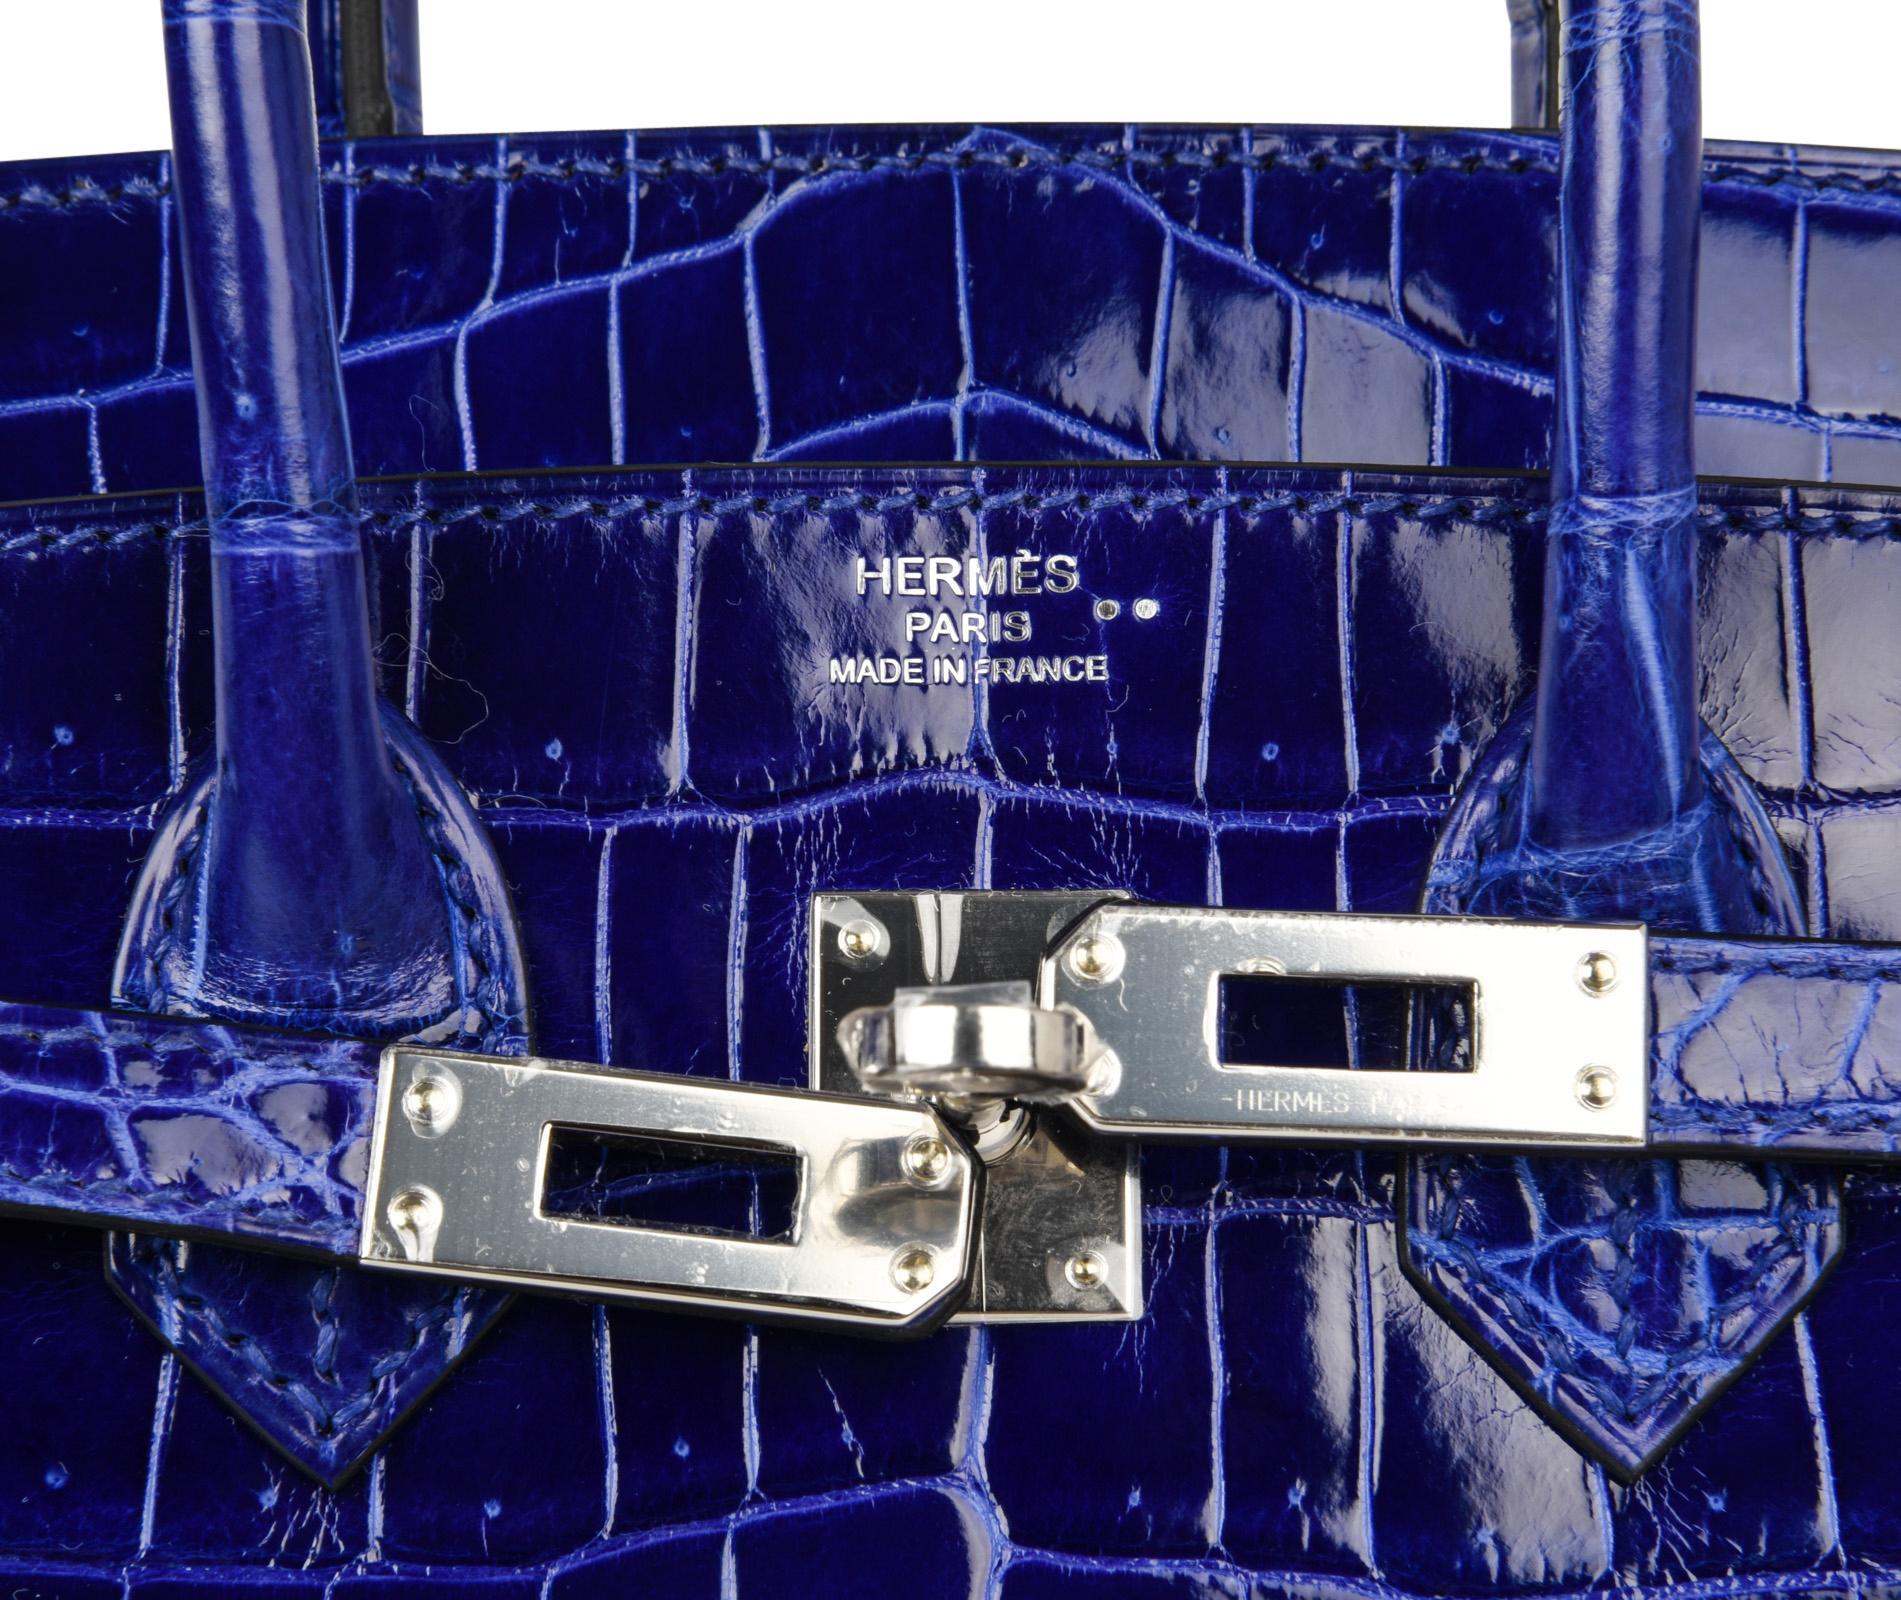 cfd94684656 Hermes Birkin 25 Bag Blue Electric Crocodile Vivid Jewel Palladium Hardware  For Sale at 1stdibs